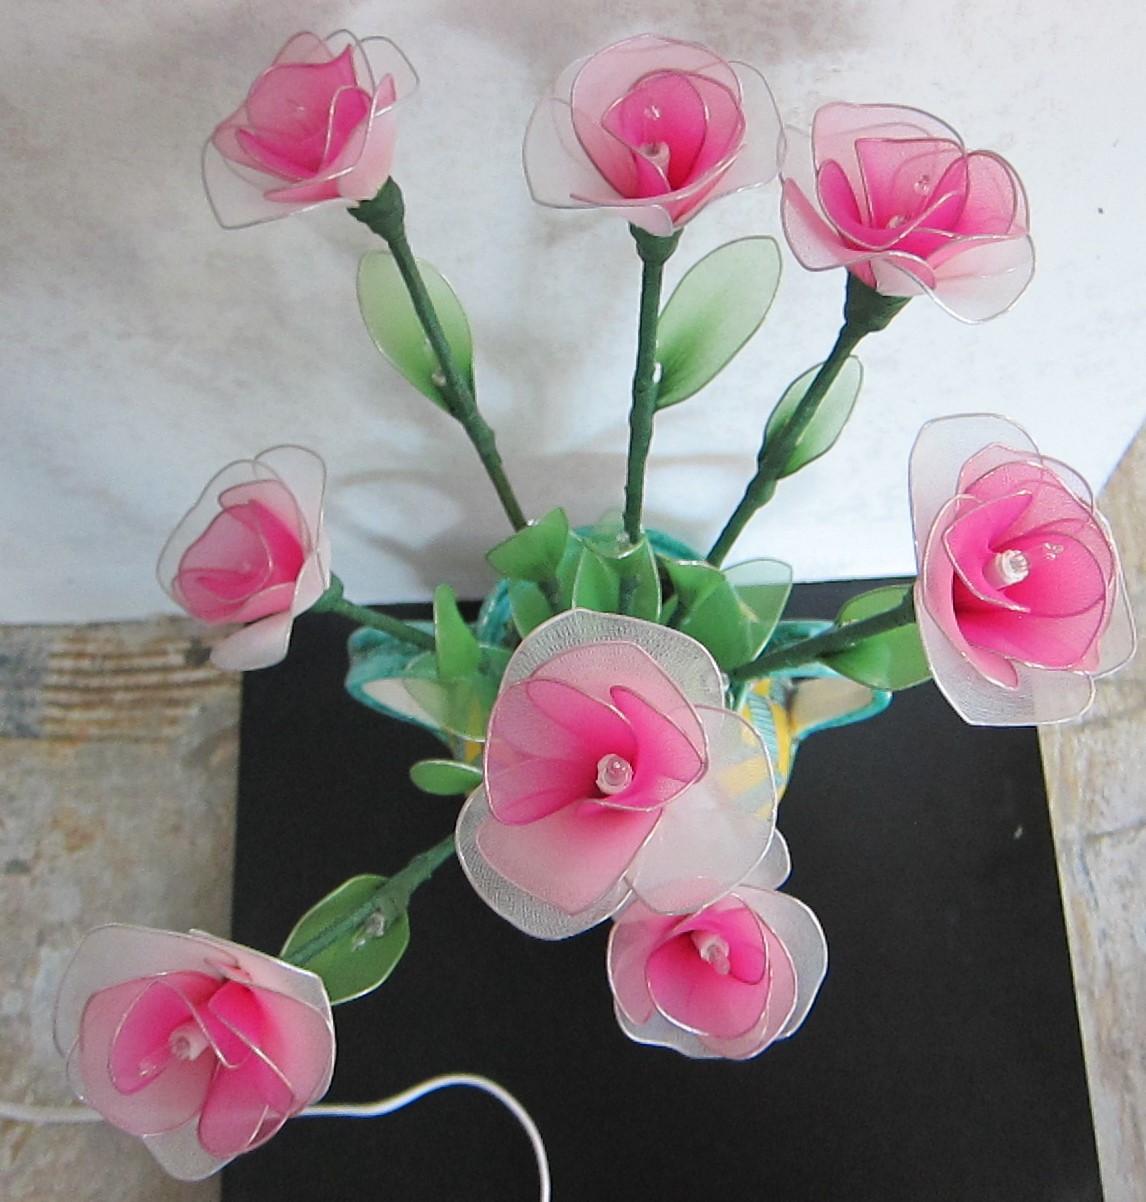 Flower Lights__4056